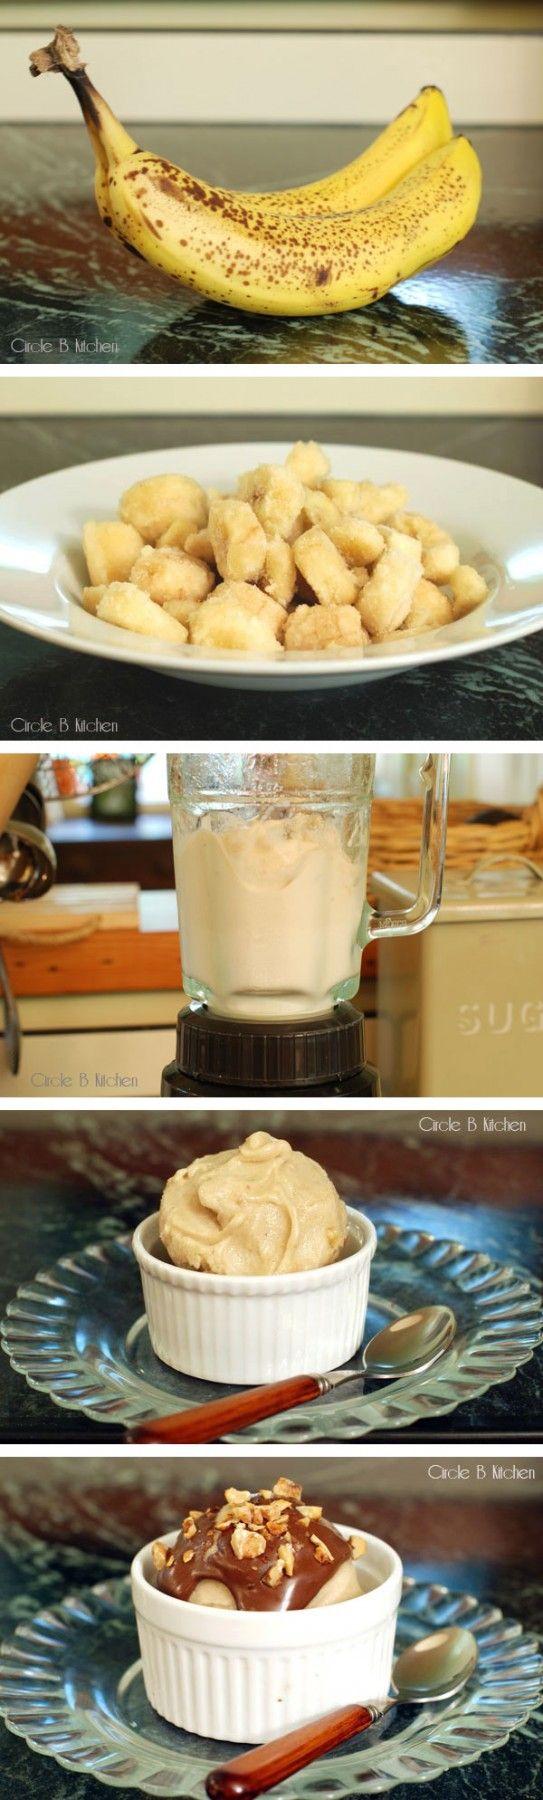 helado-simple-platano-pecados-reposteria